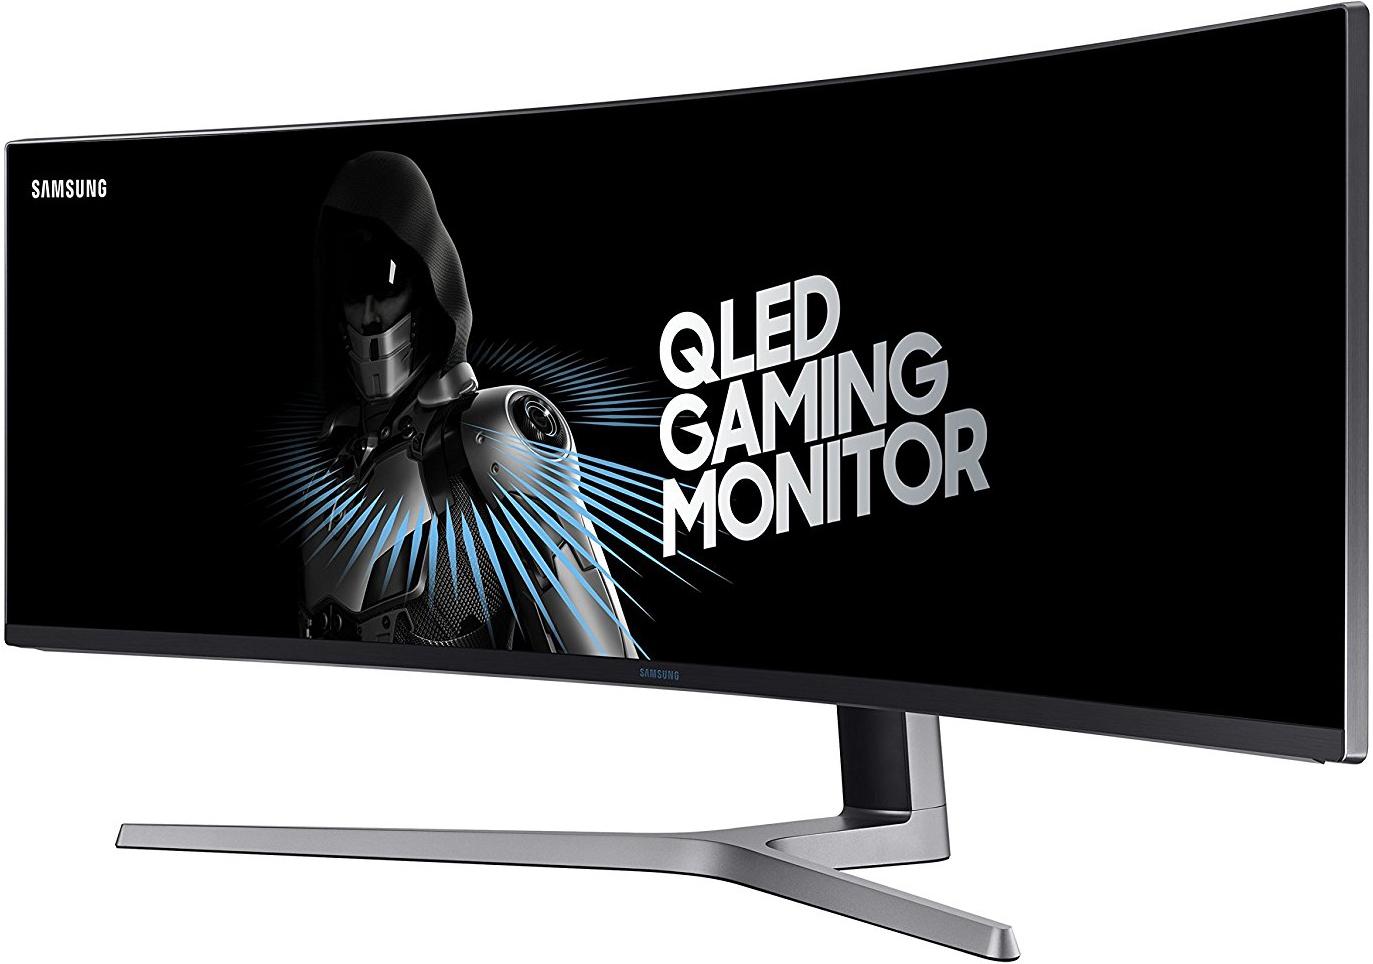 Samsung Announces First Freesync 2 Monitors: CHG70 & CHG90 - Quantum